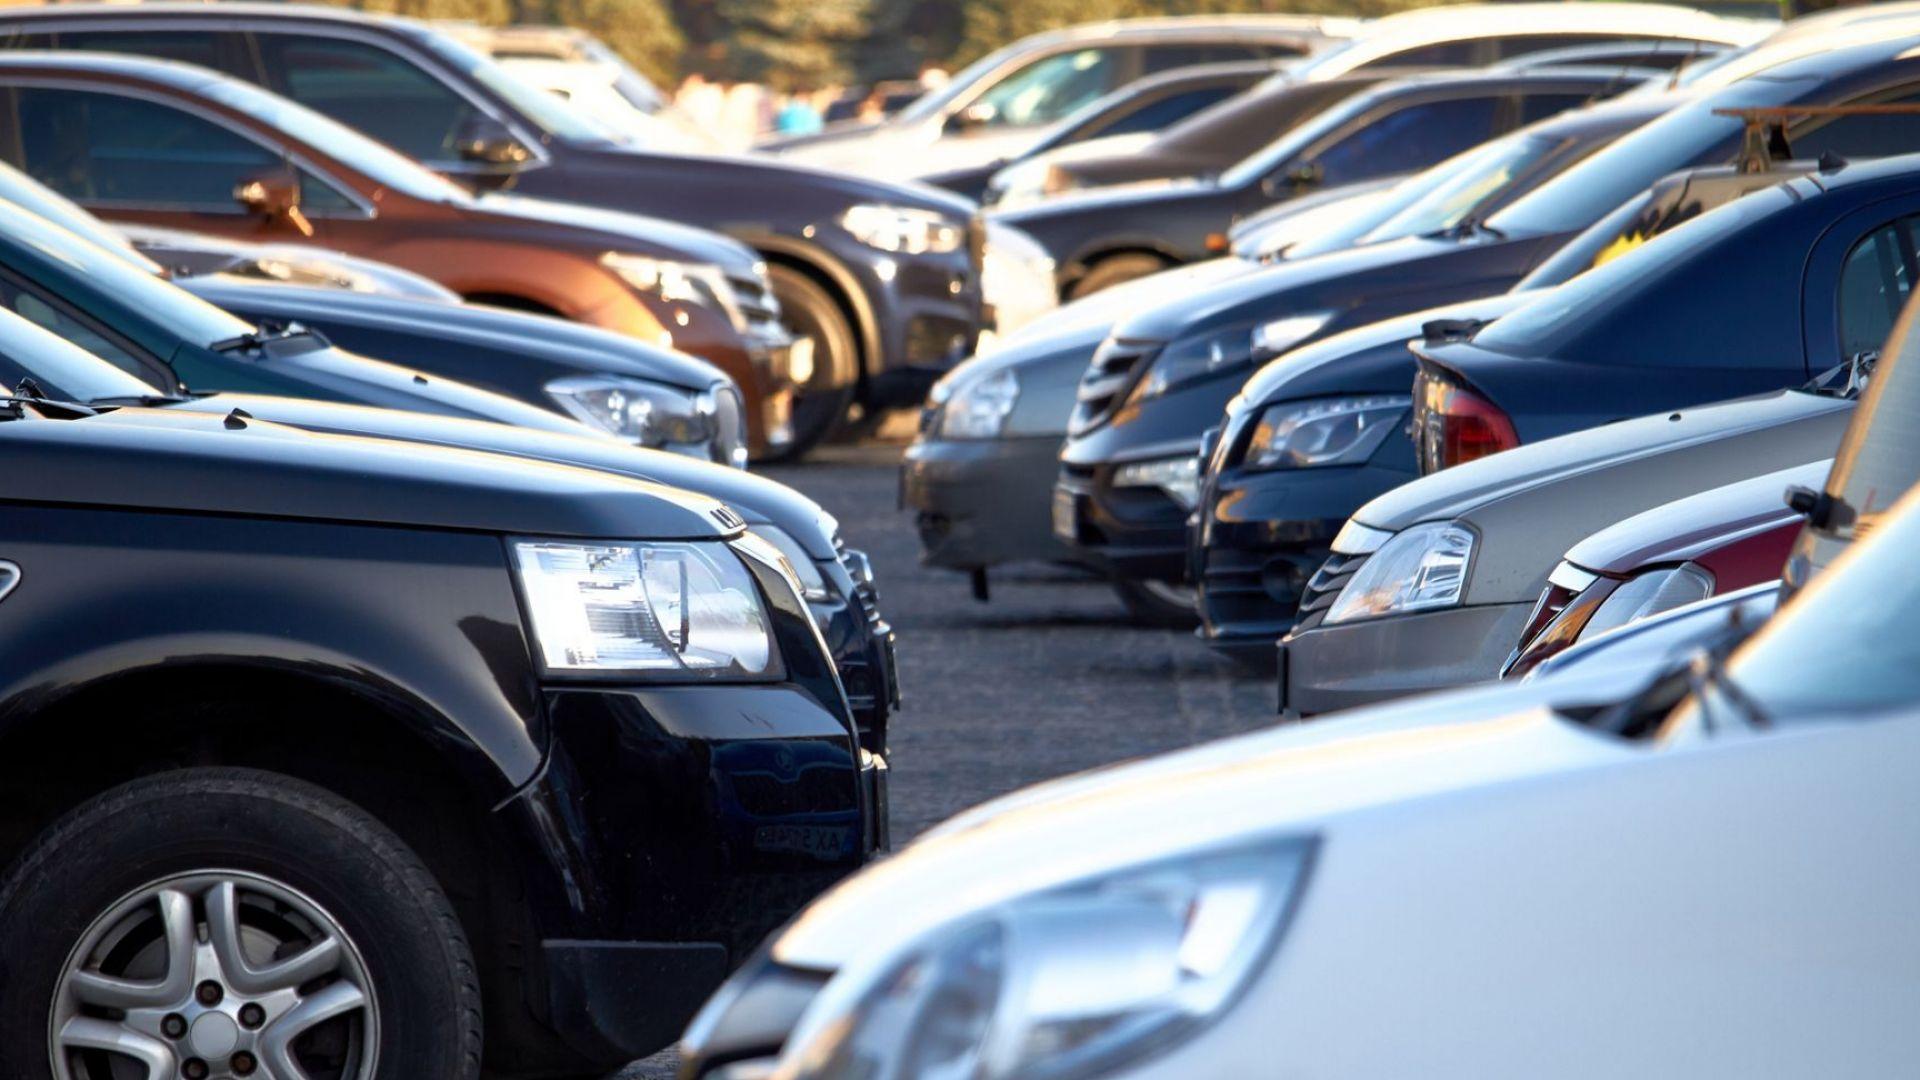 Делът на дизеловите и бензиновите автомобили в Европа се топи